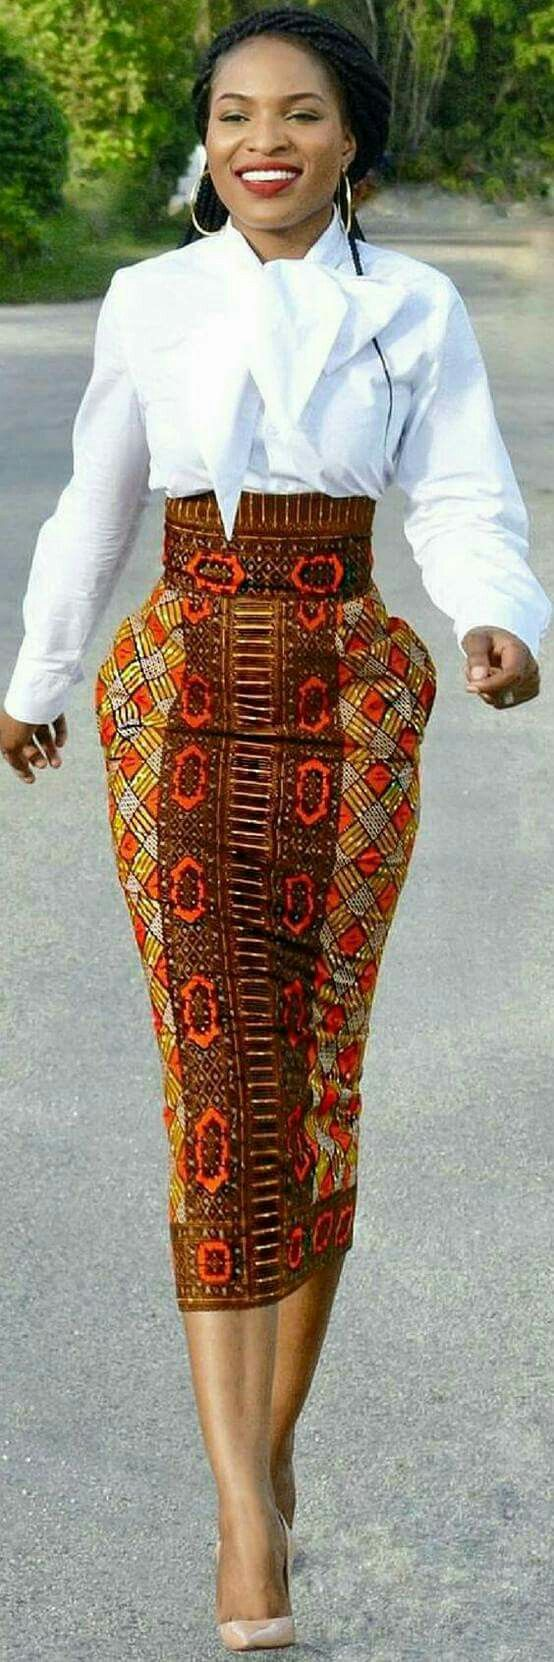 Ankara short dresses style africans african fashion and ankara